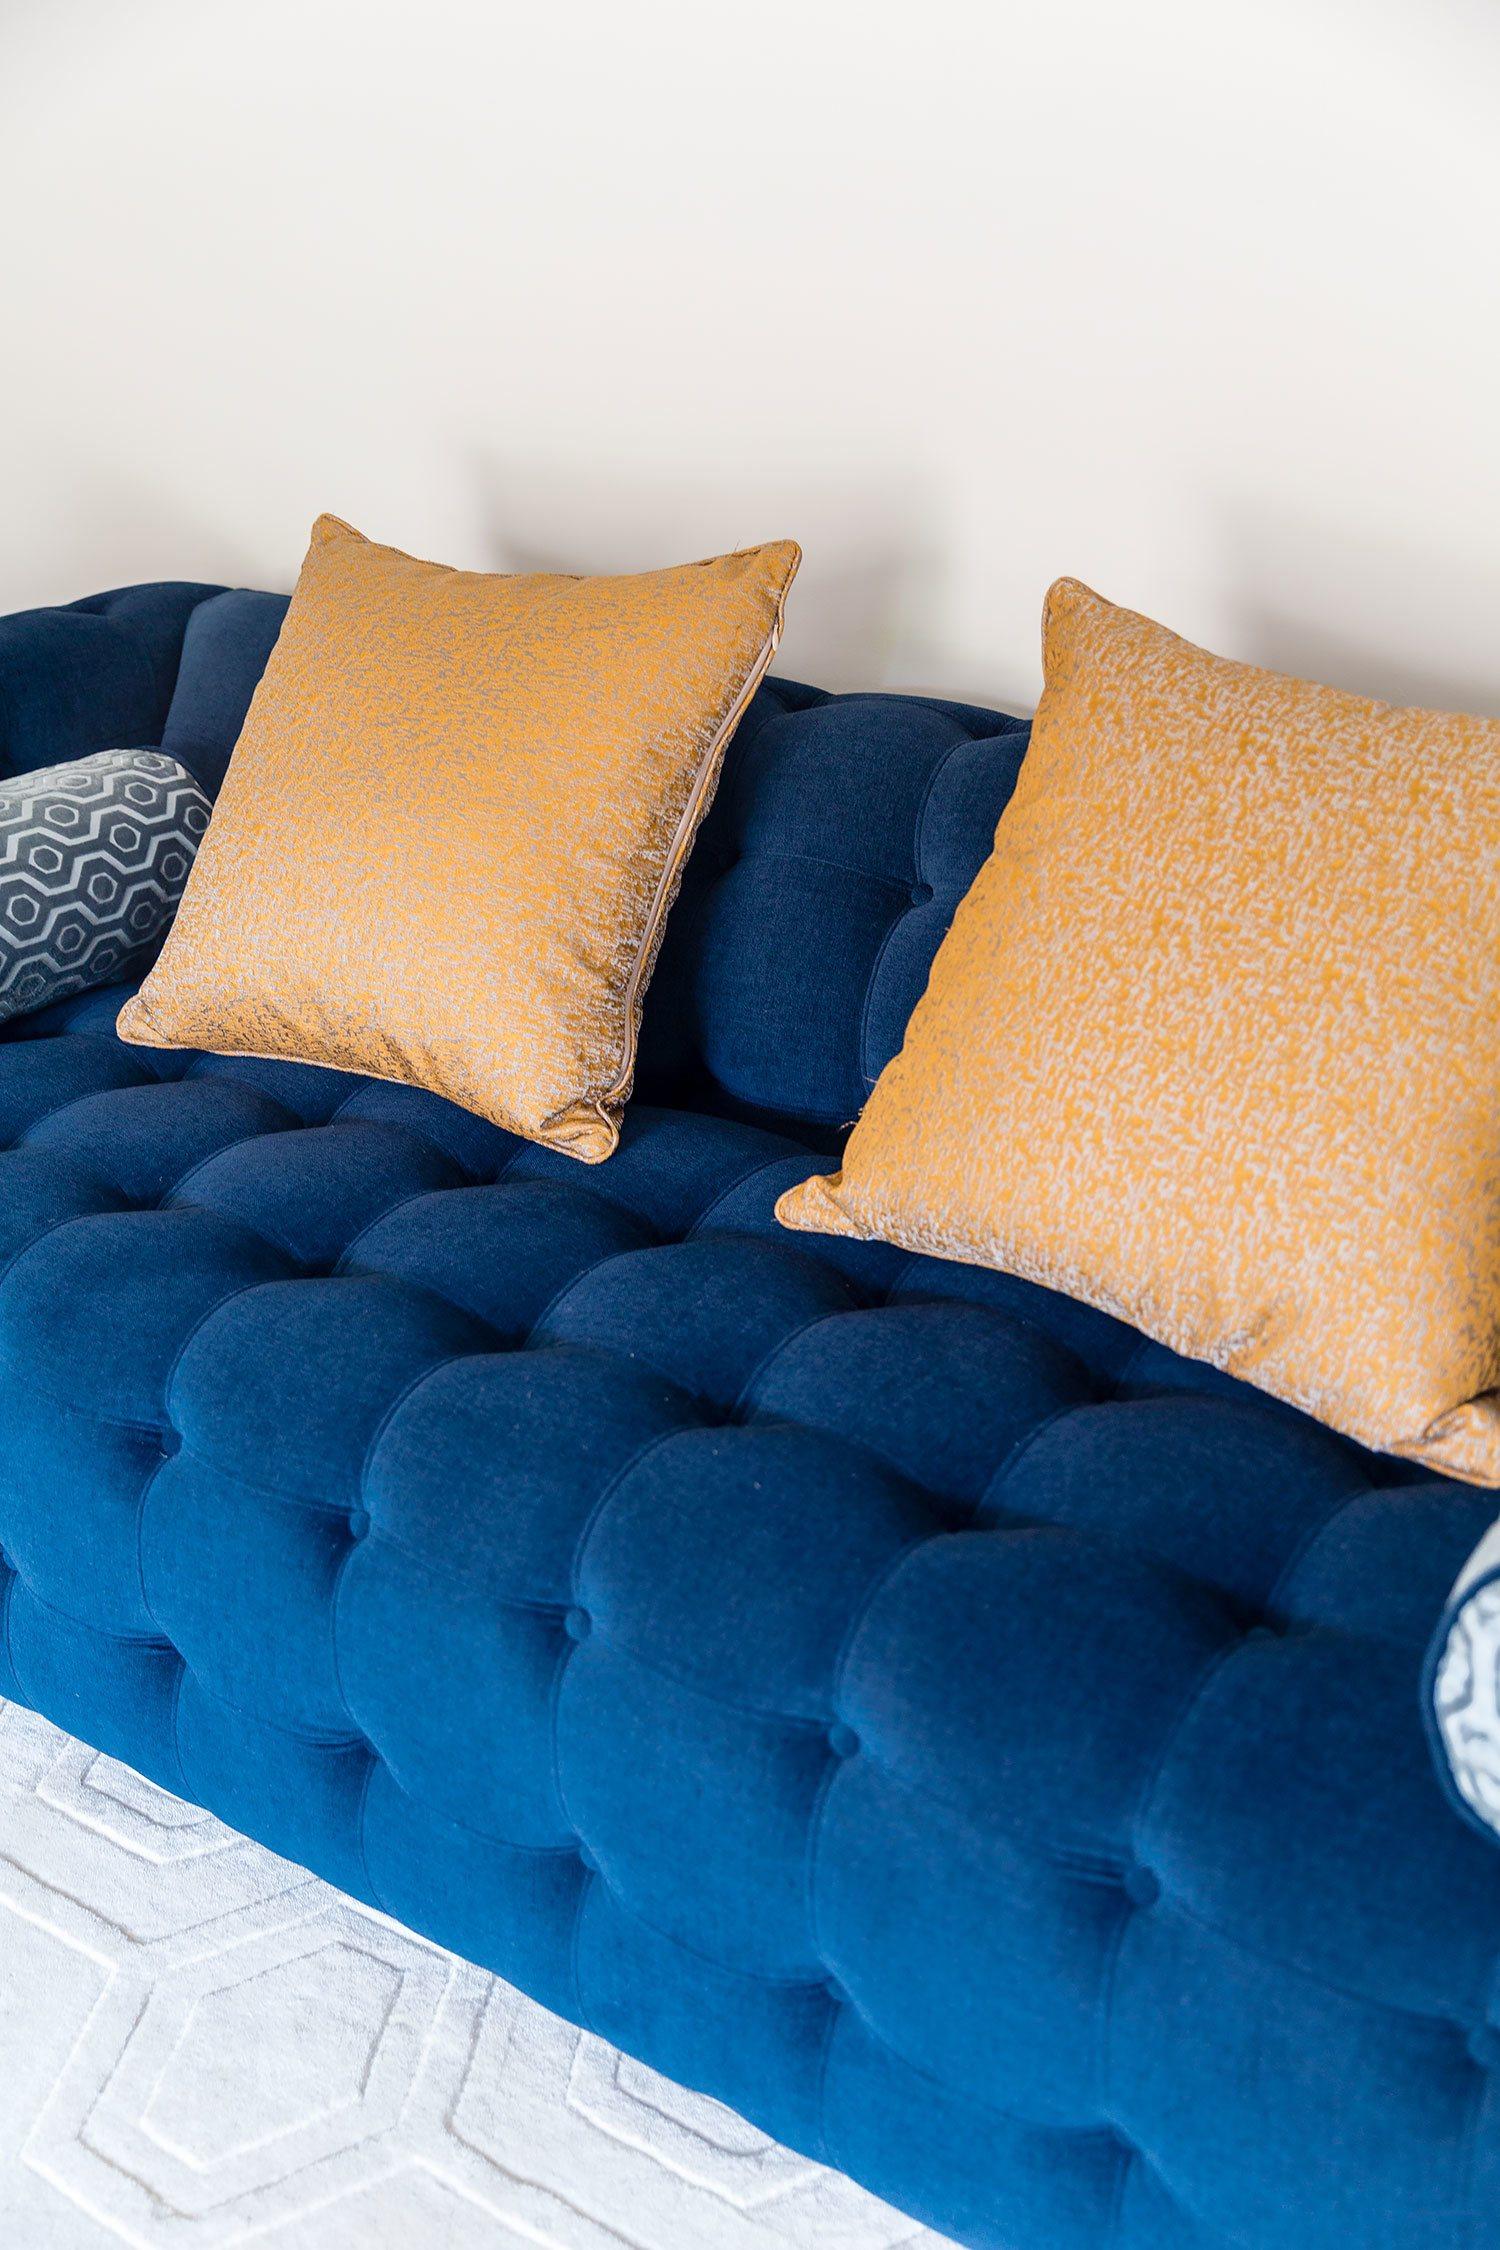 raymour and flanigan diana sofa